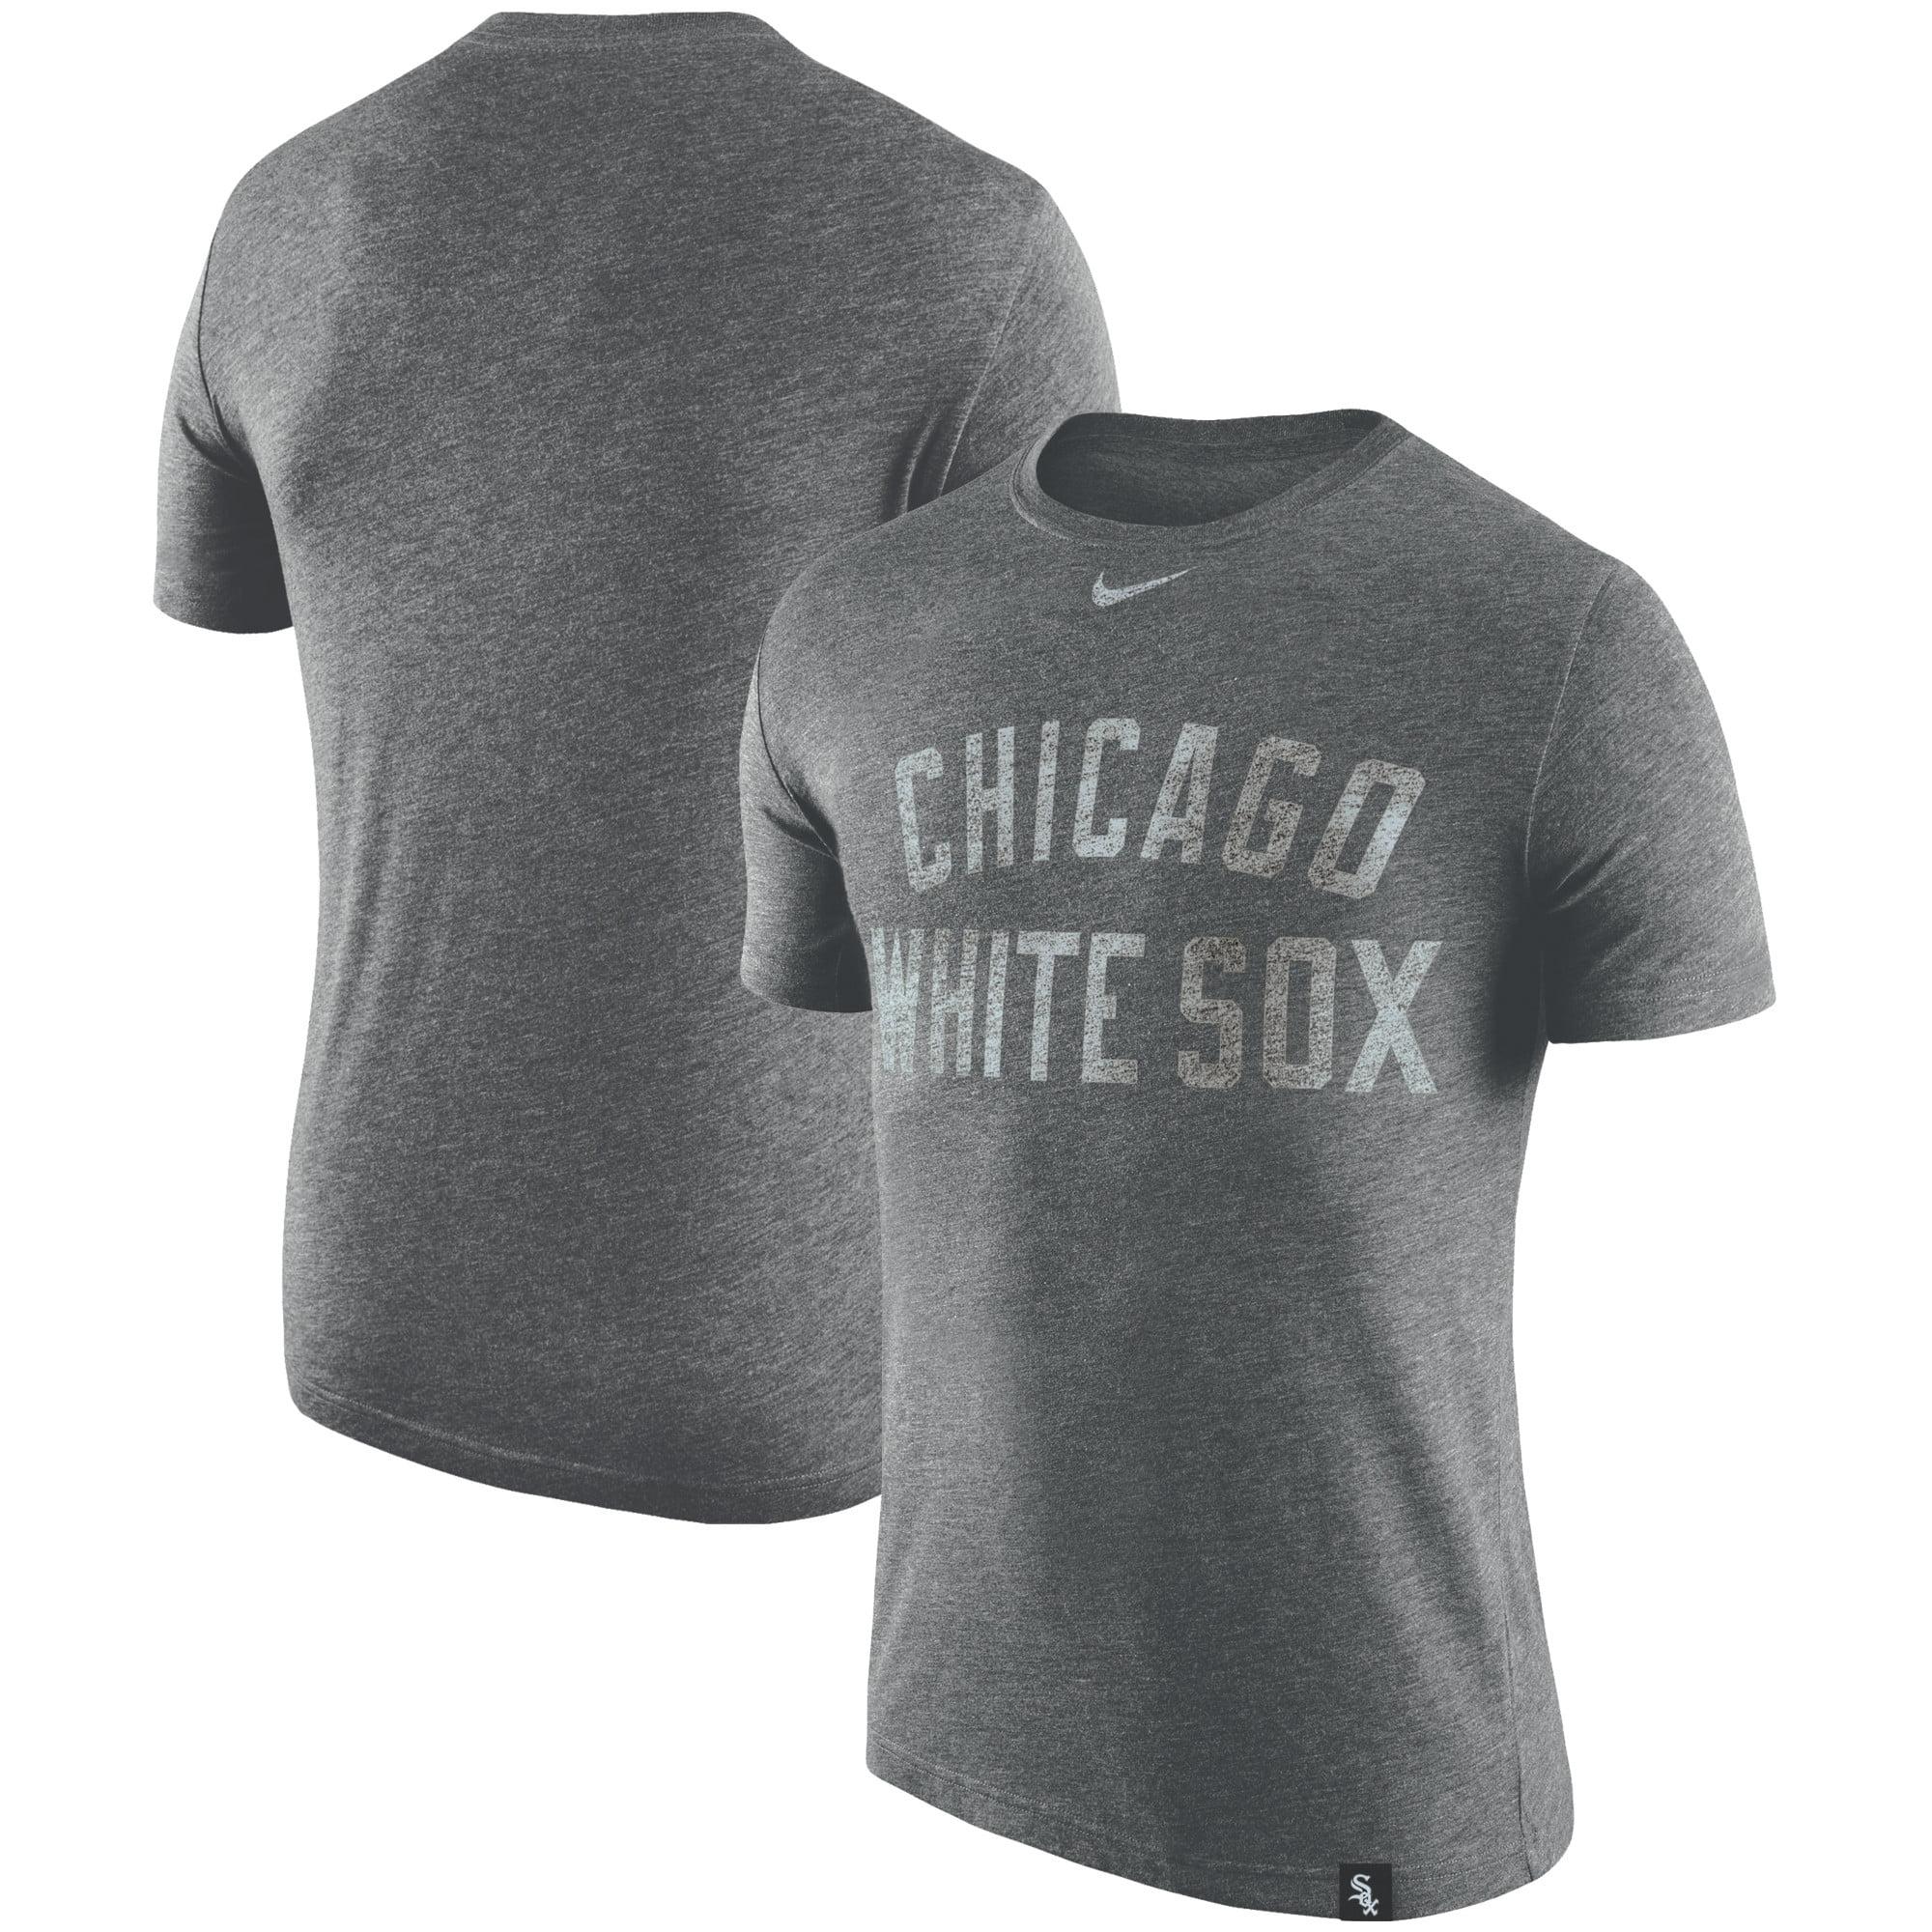 Chicago White Sox Nike Tri-Blend DNA Performance T-Shirt - Heathered Black